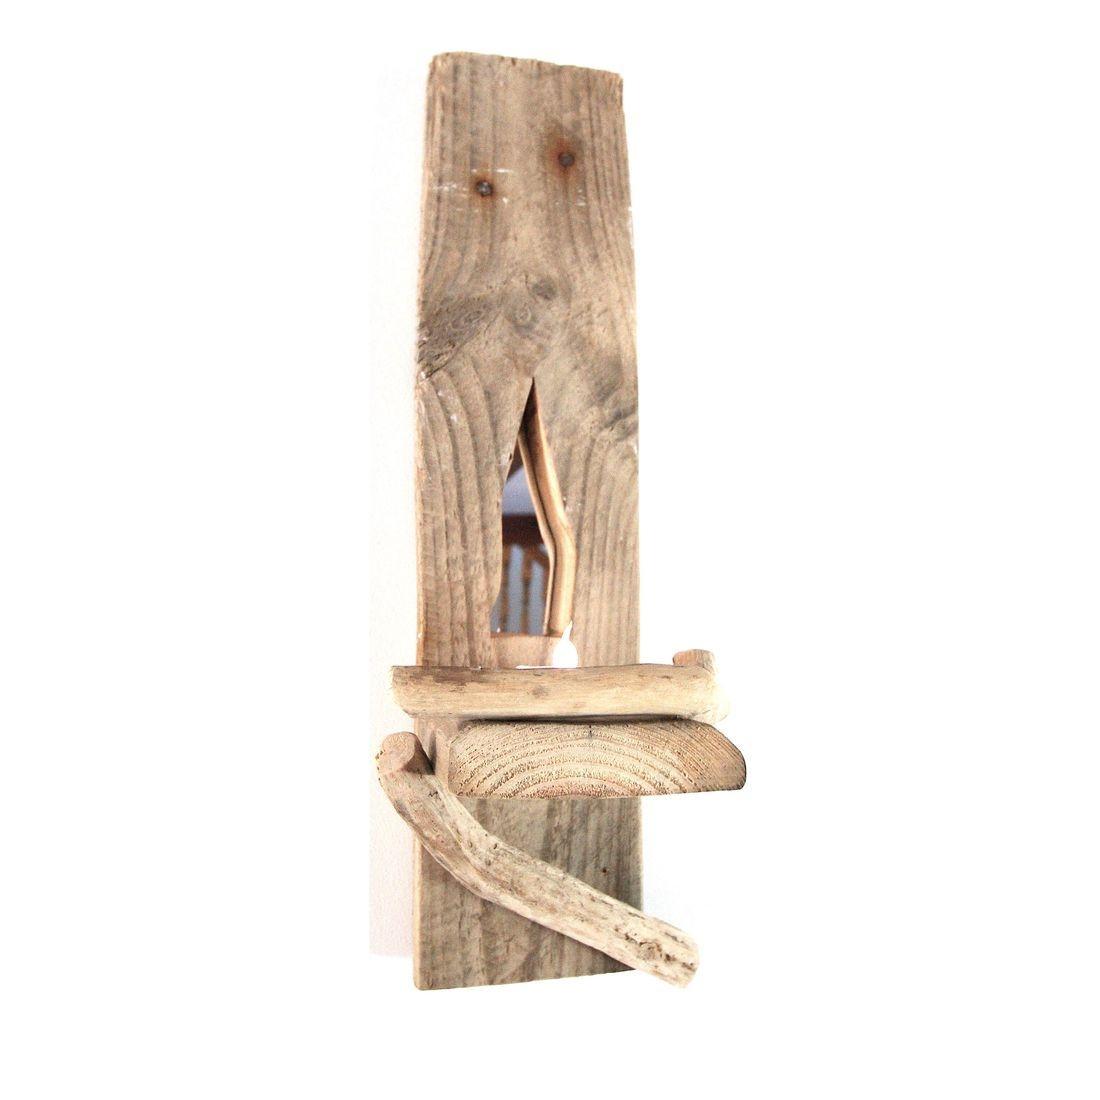 Driftwood Sconce single 4